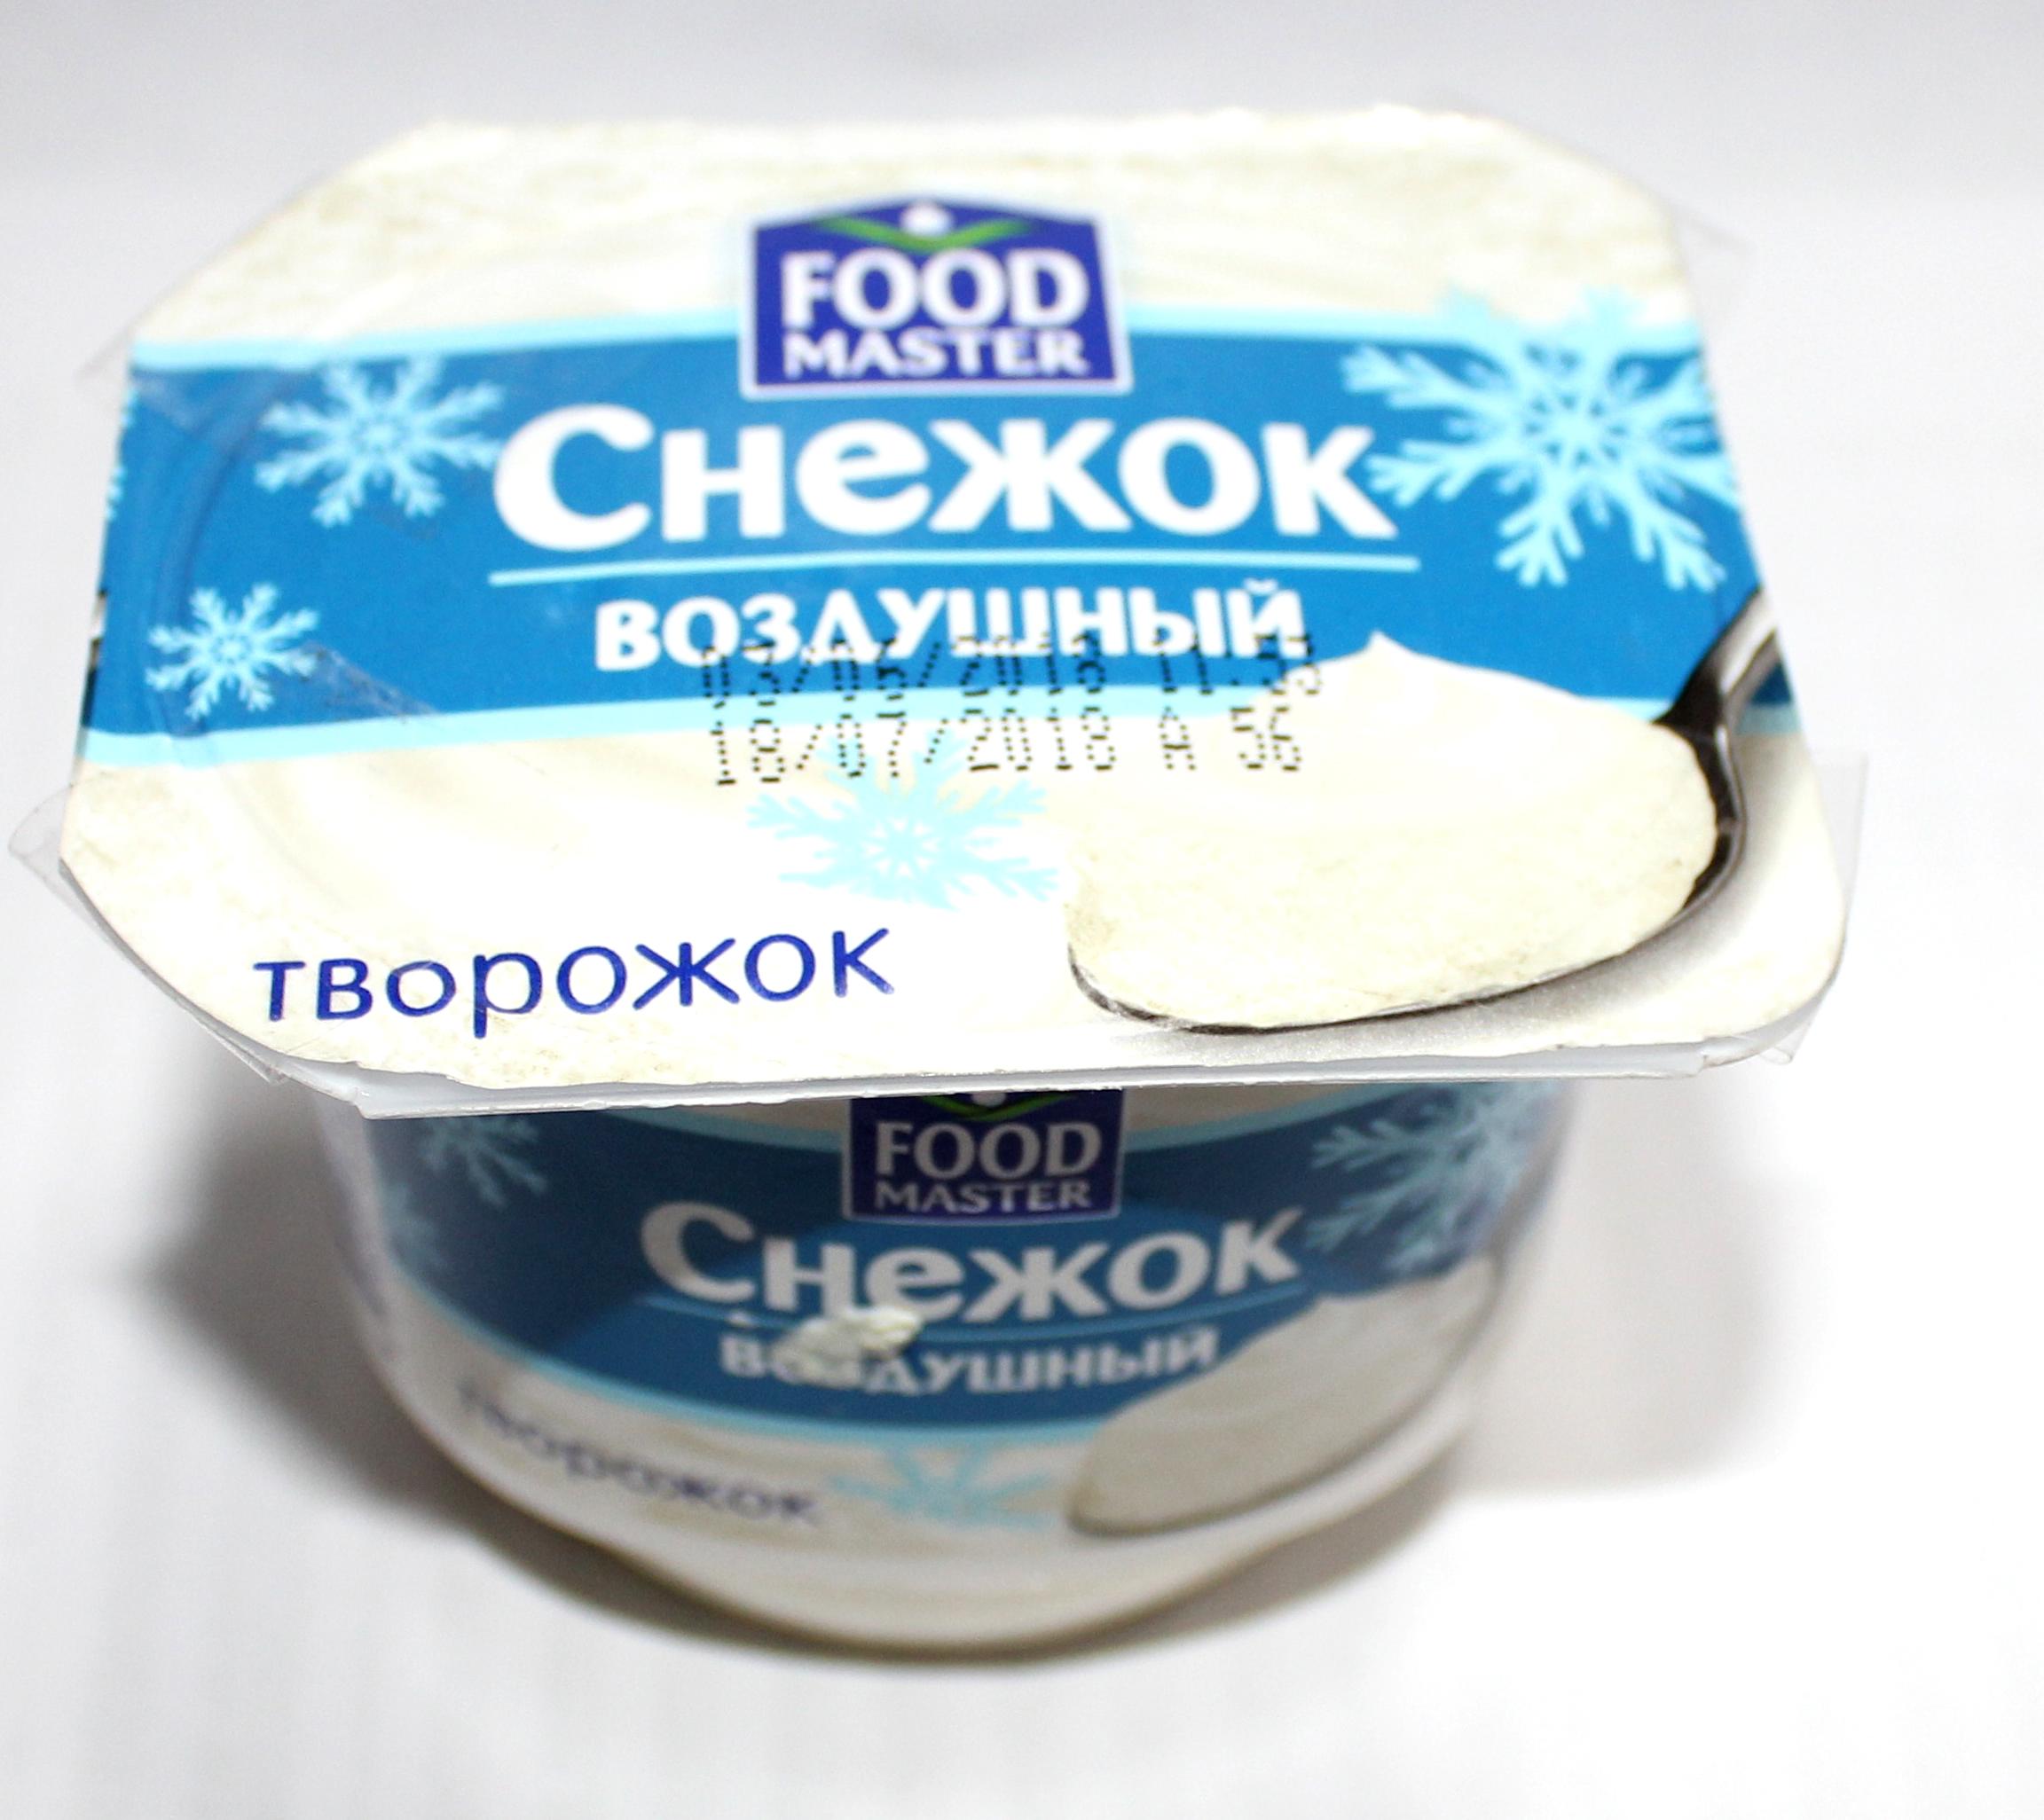 FOOD MASTER - ТВОРОЖОК FOOD MASTER ВЗБИТЫЙ СНЕЖОК 3,8% 100ГР 4870207313359